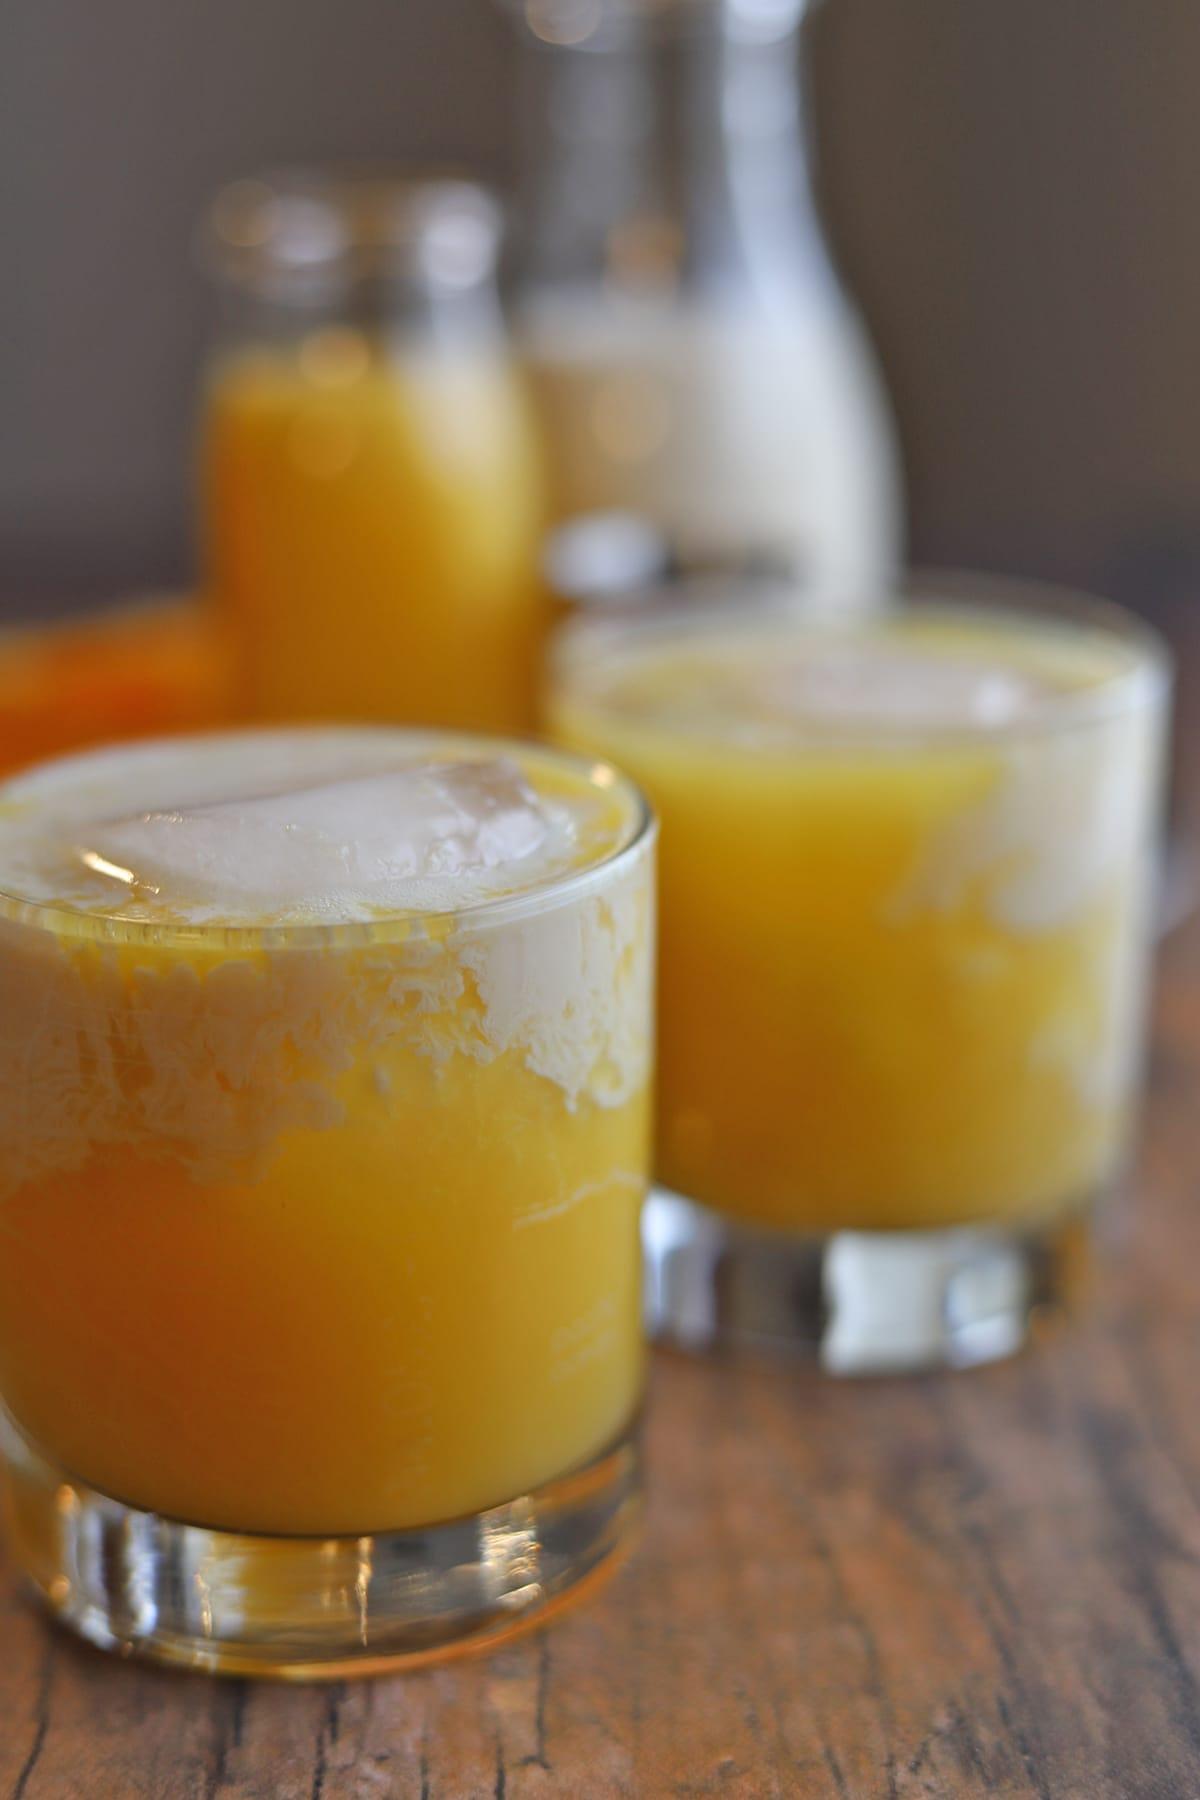 Orange juice cocktail on table with splash of almond milk.